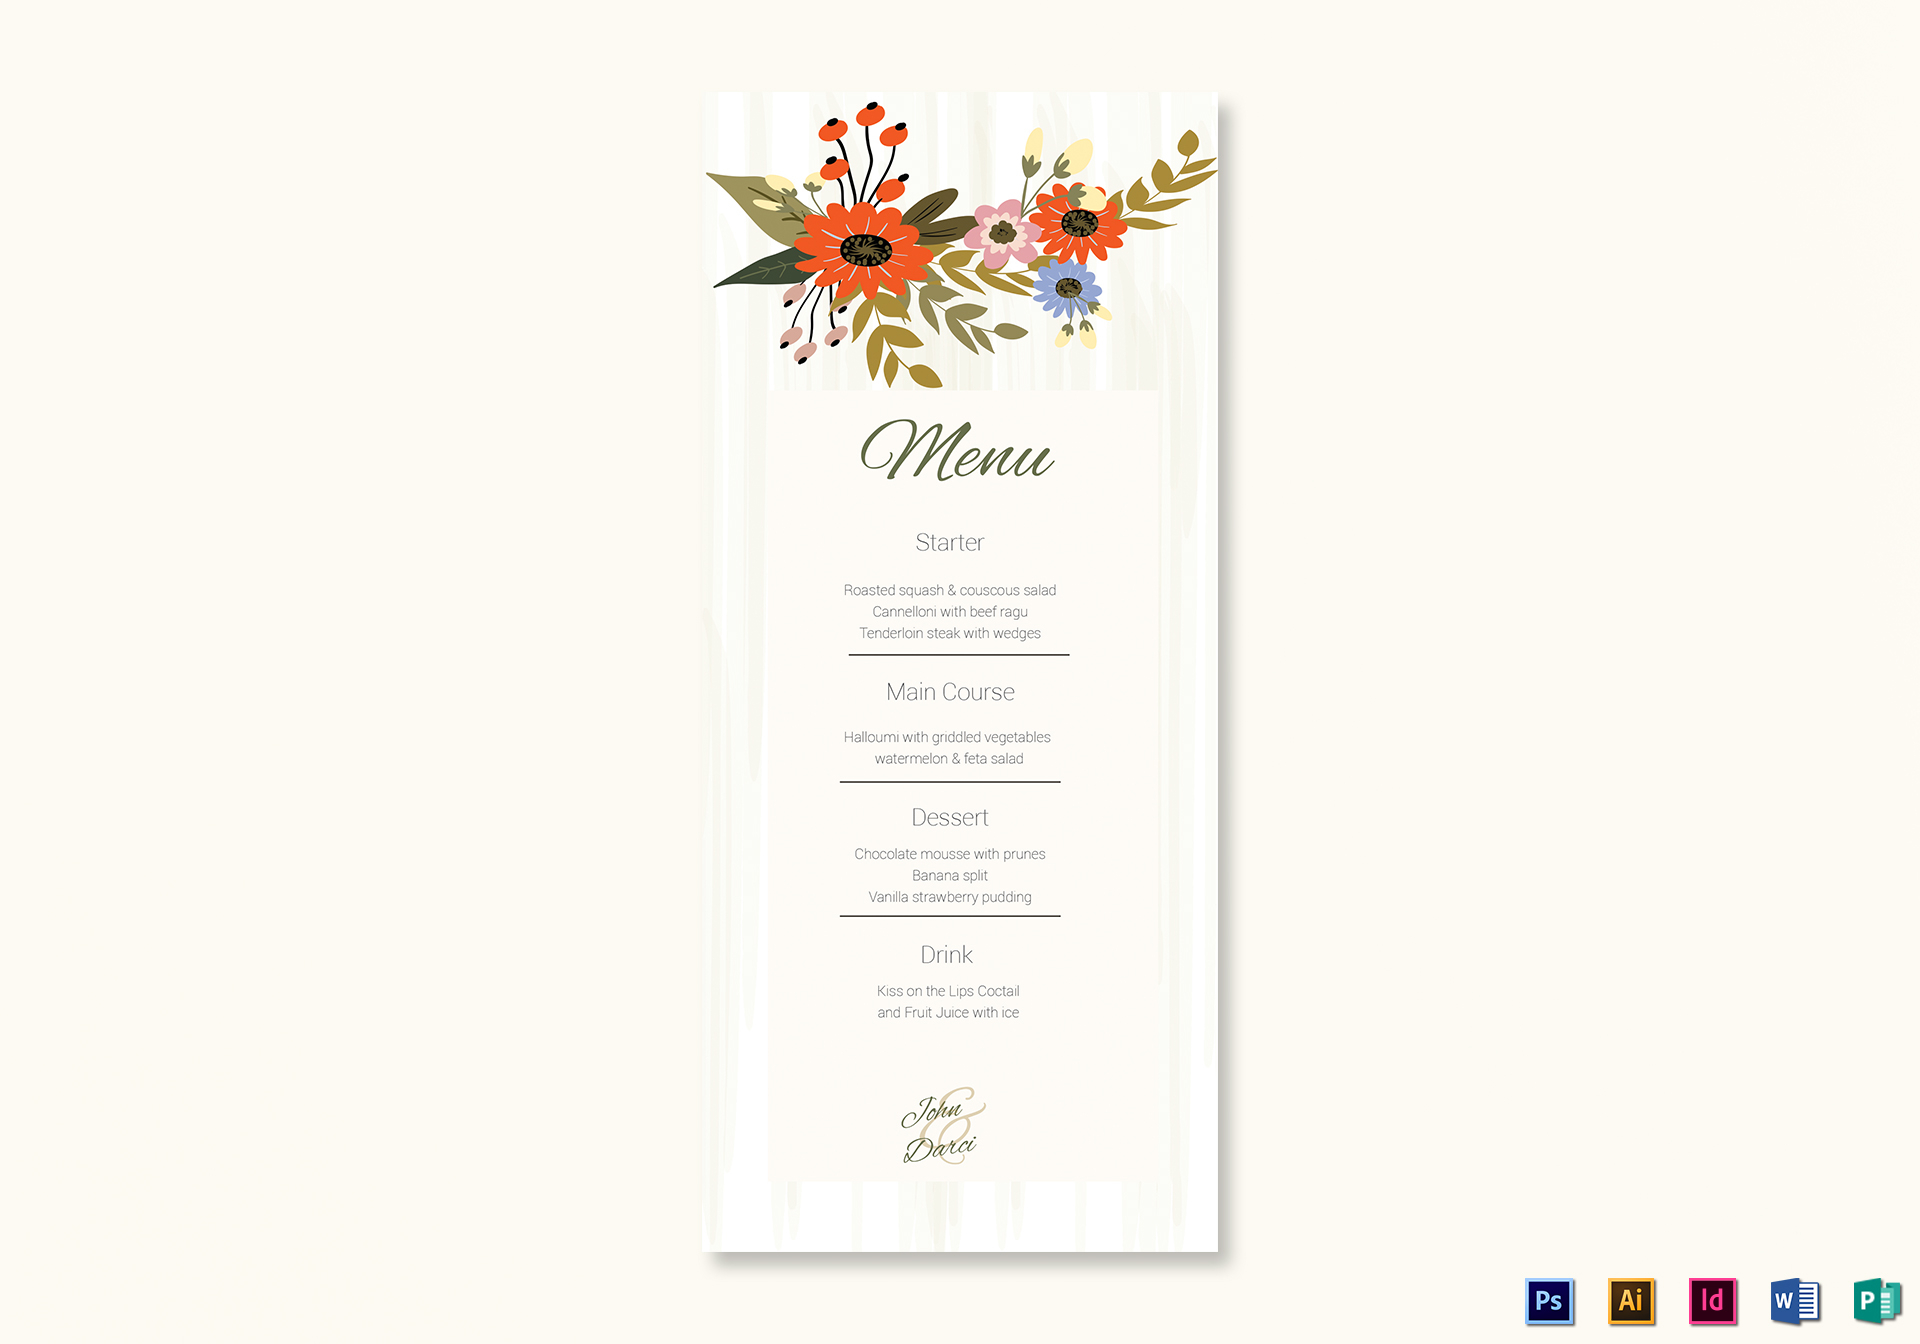 Summer Floral Wedding Menu Card Design Template in